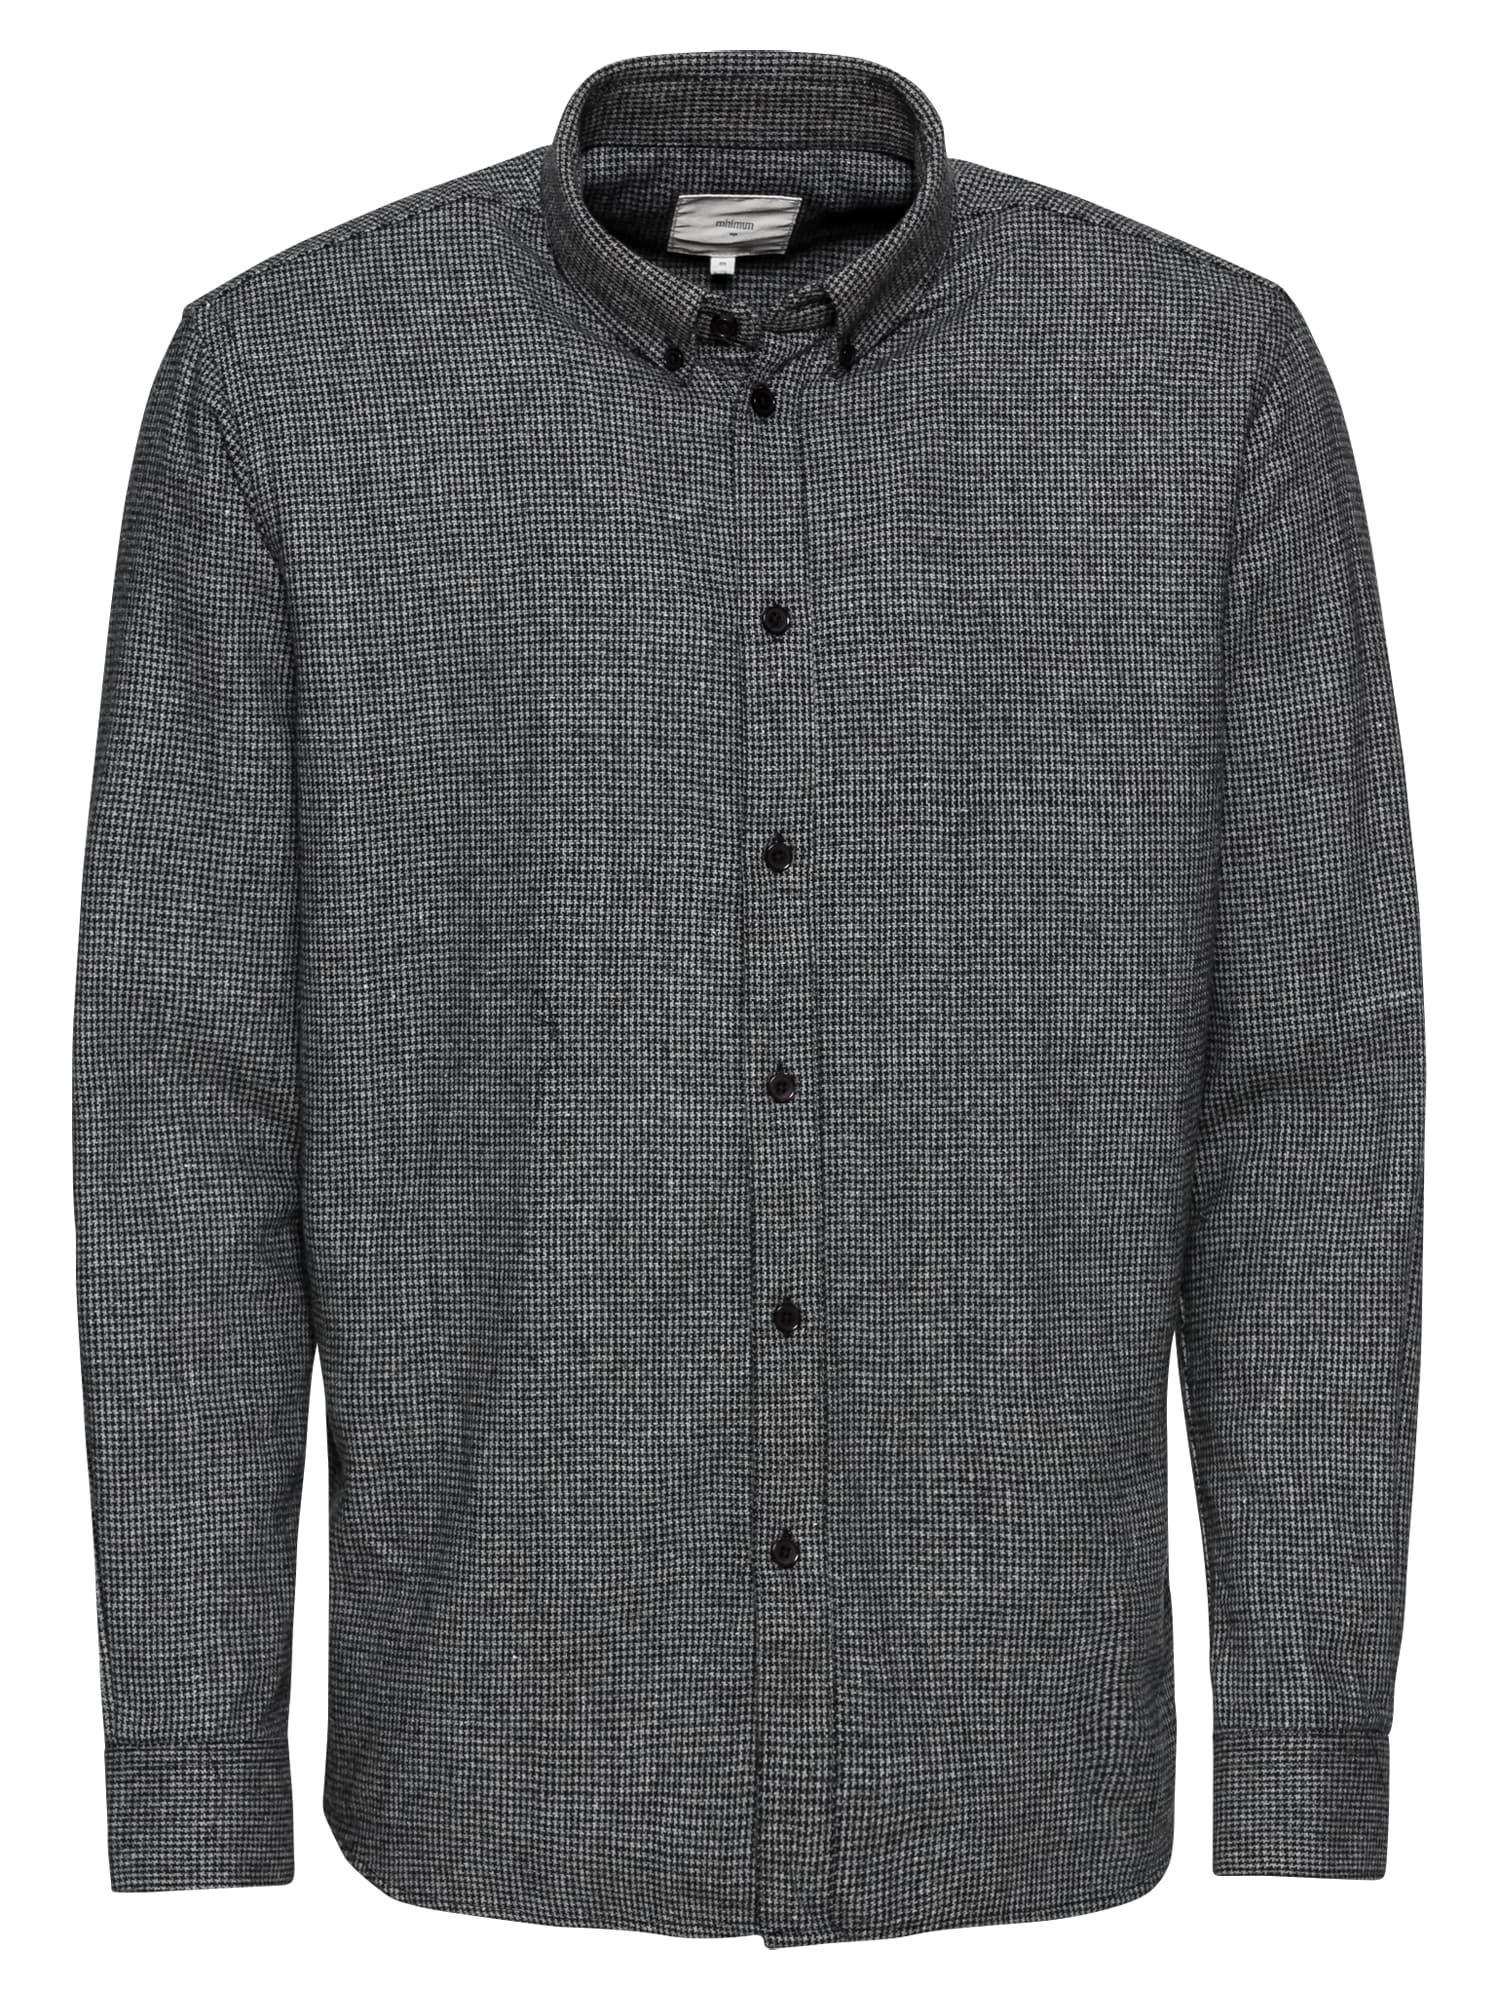 Košile walther šedá Minimum